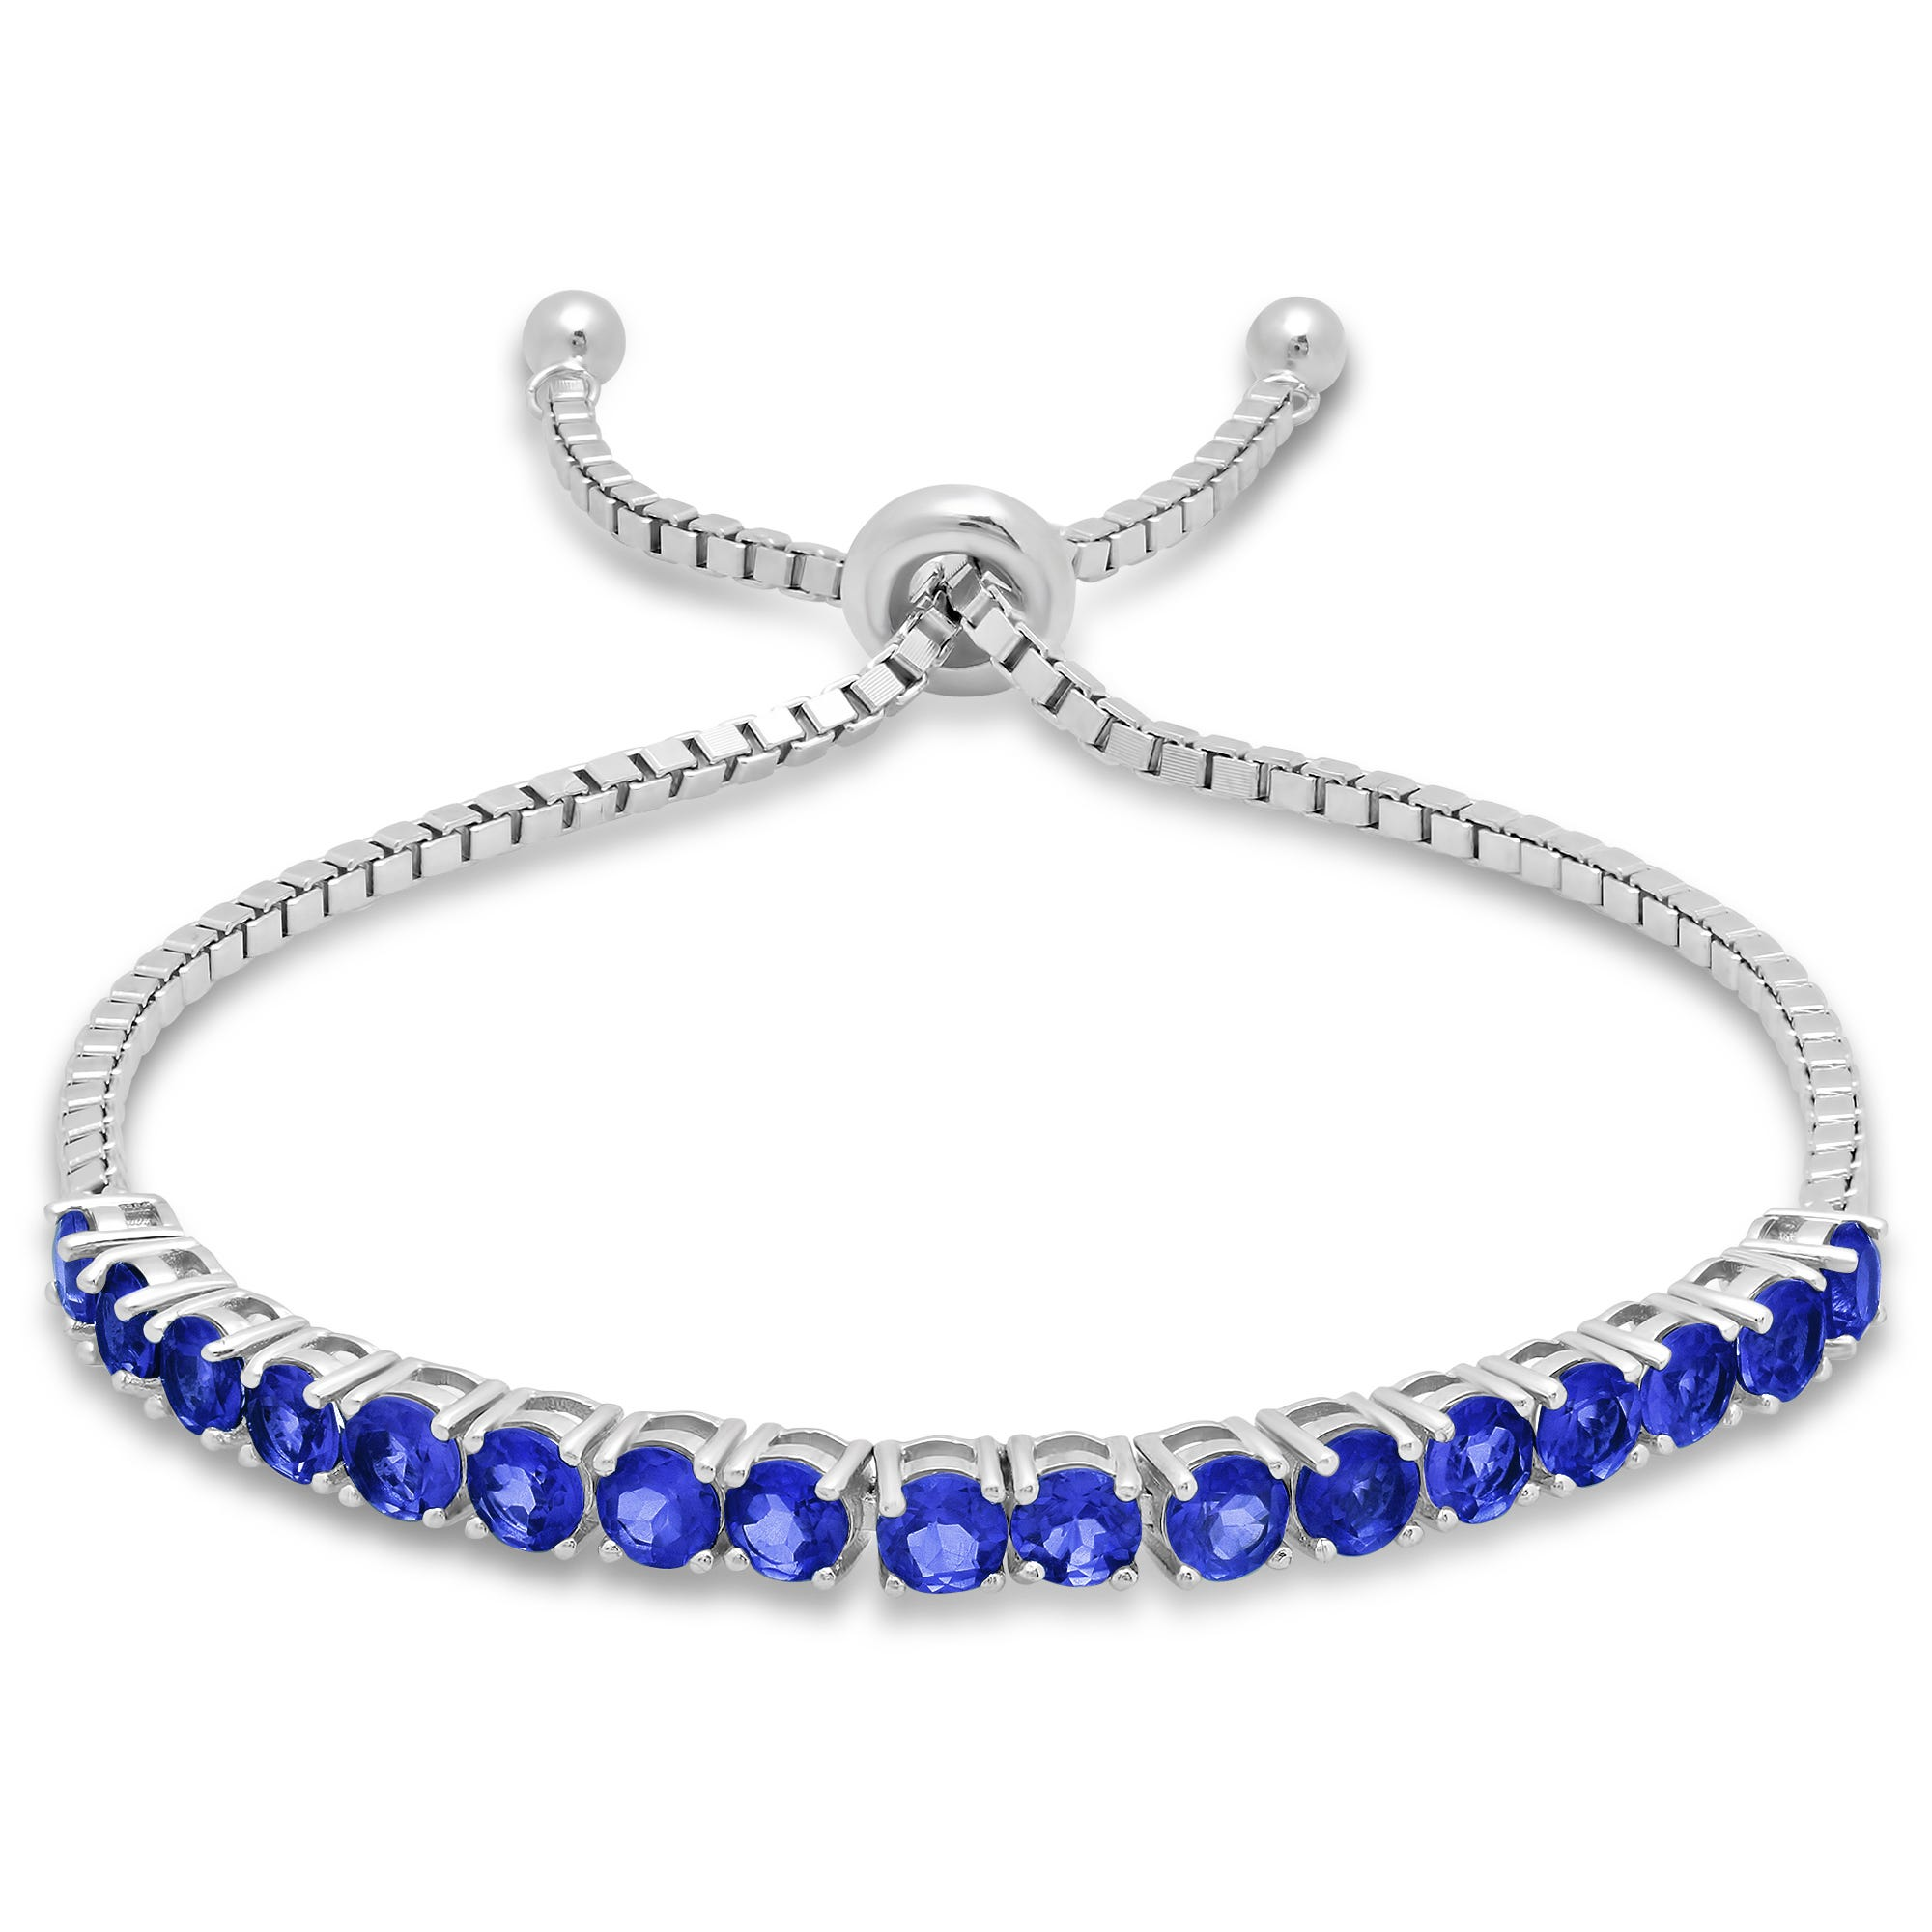 Blue Sapphire Adjustable Bolo Bracelet in Sterling Silver